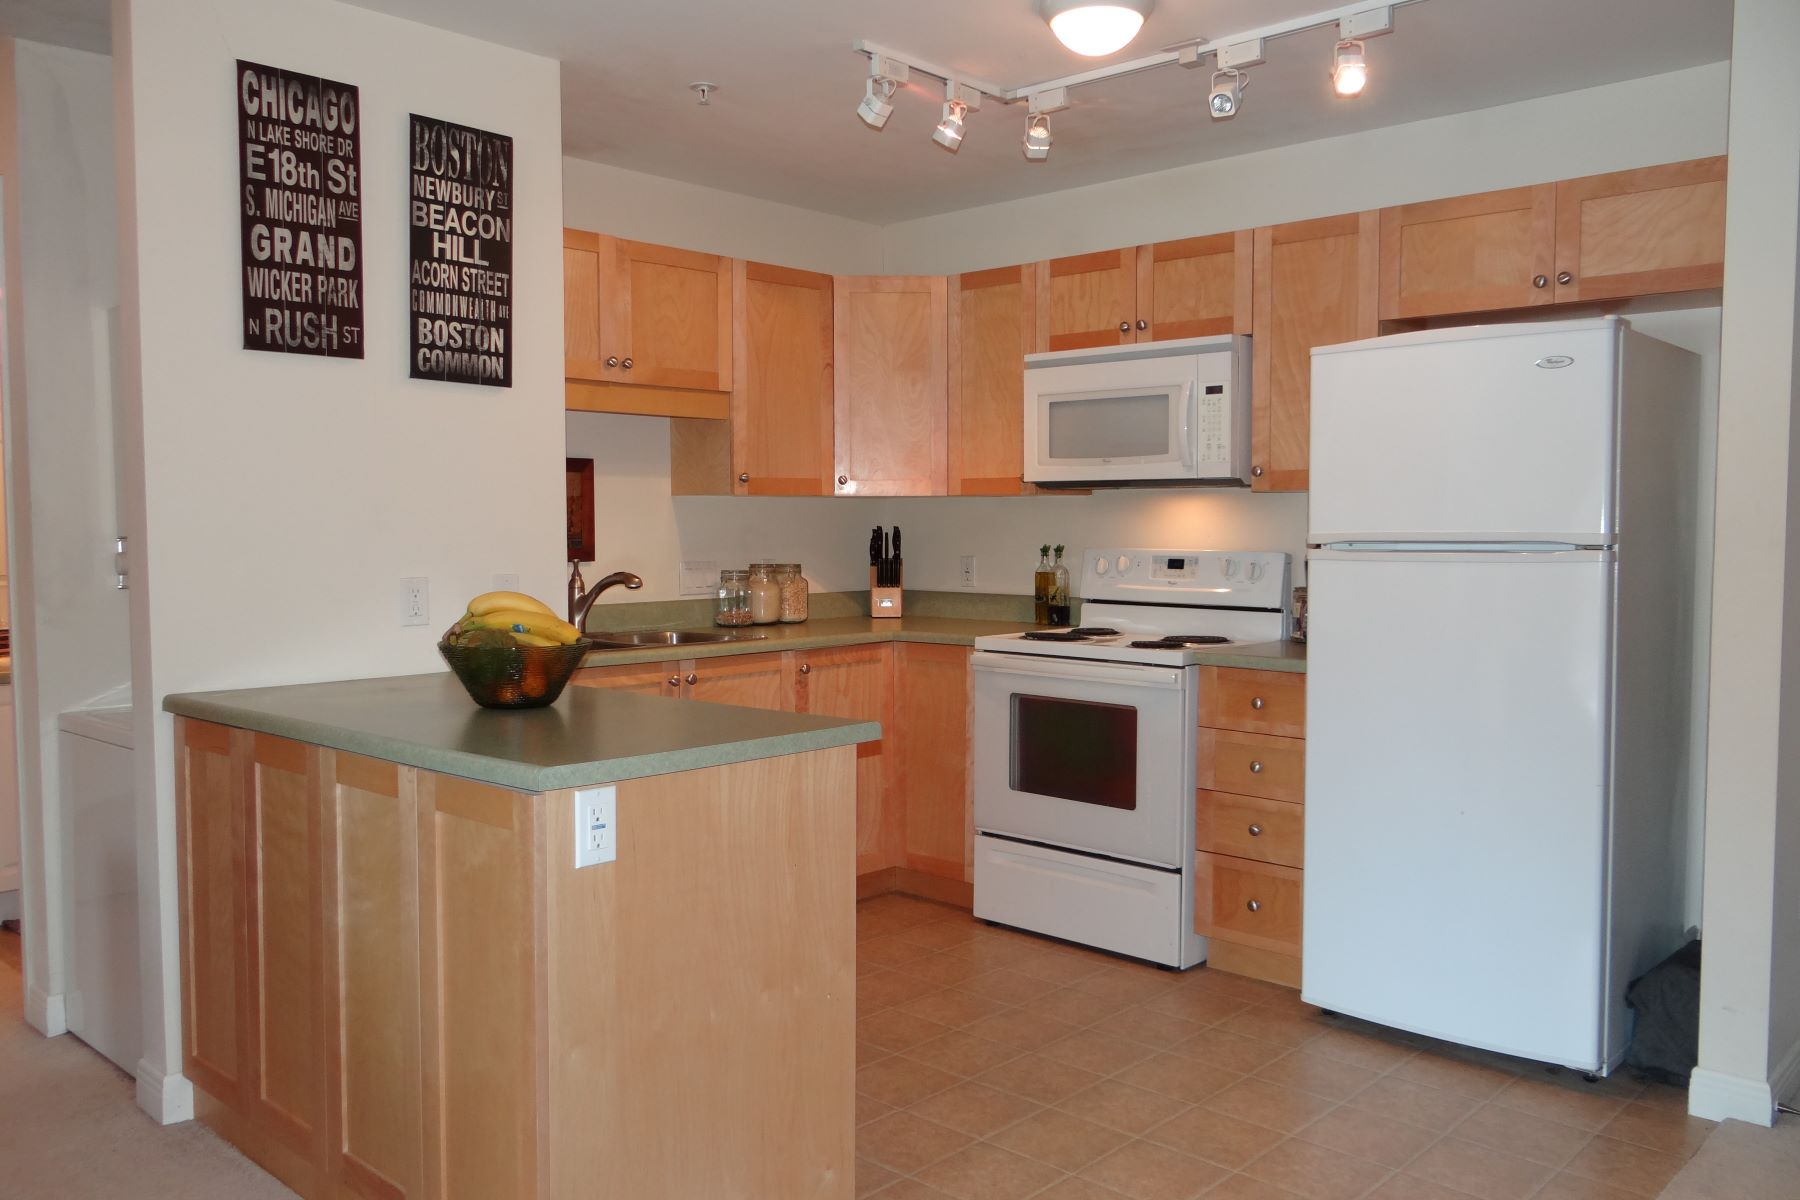 Condominium for Sale at Nature Walk - 2 Bedroom Condo in Lebanon 287 Mascoma Street Ext 103, Lebanon, New Hampshire, 03766 United States